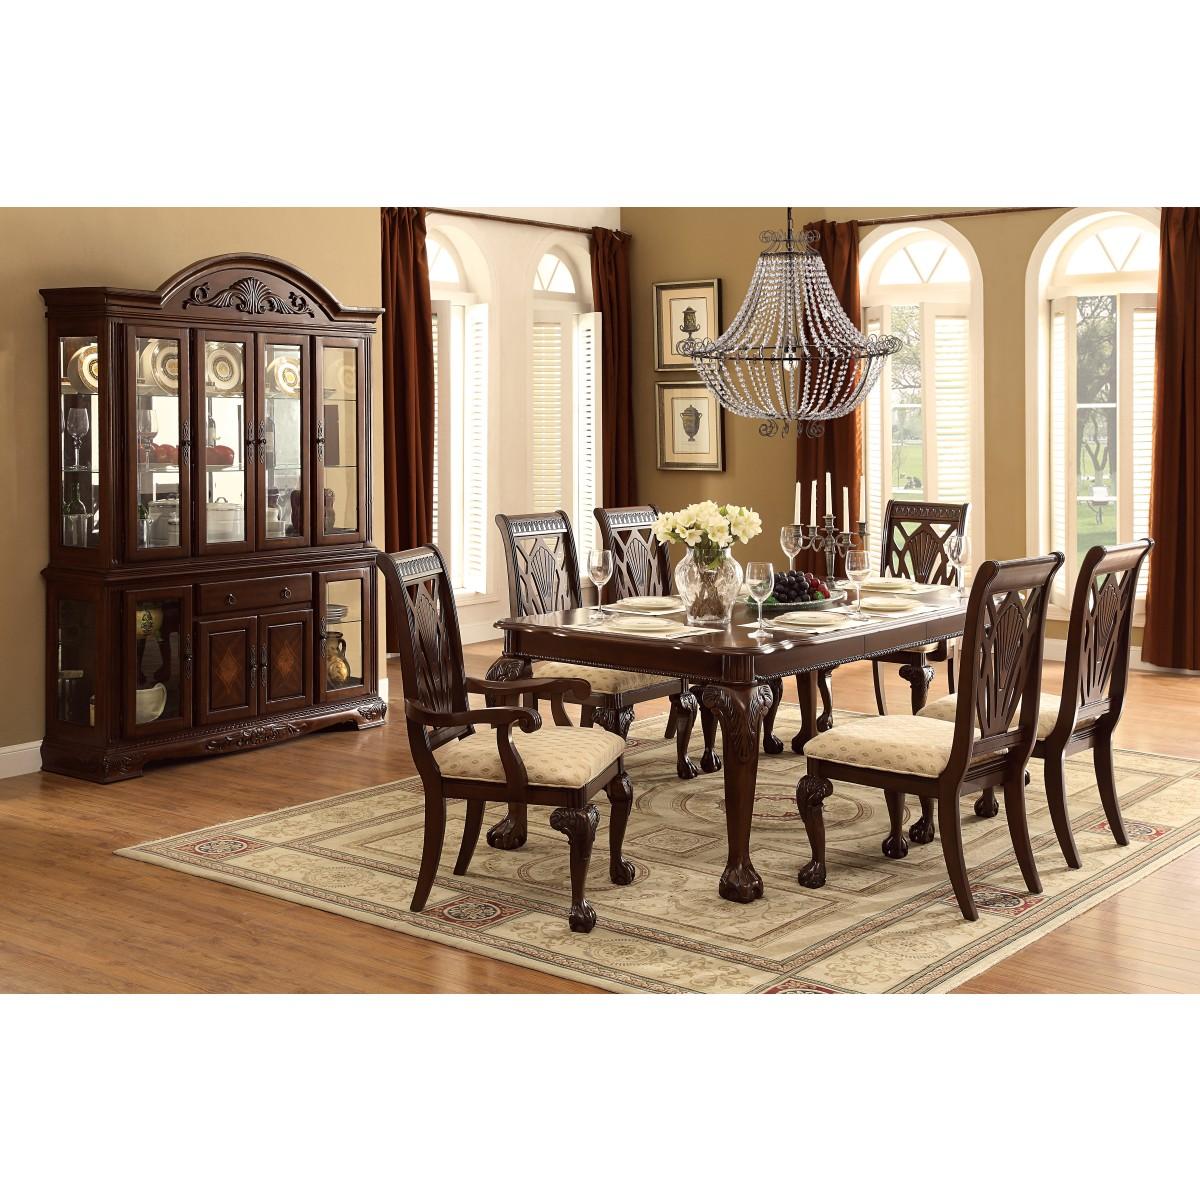 Dining Room Table For 10: Homelegance